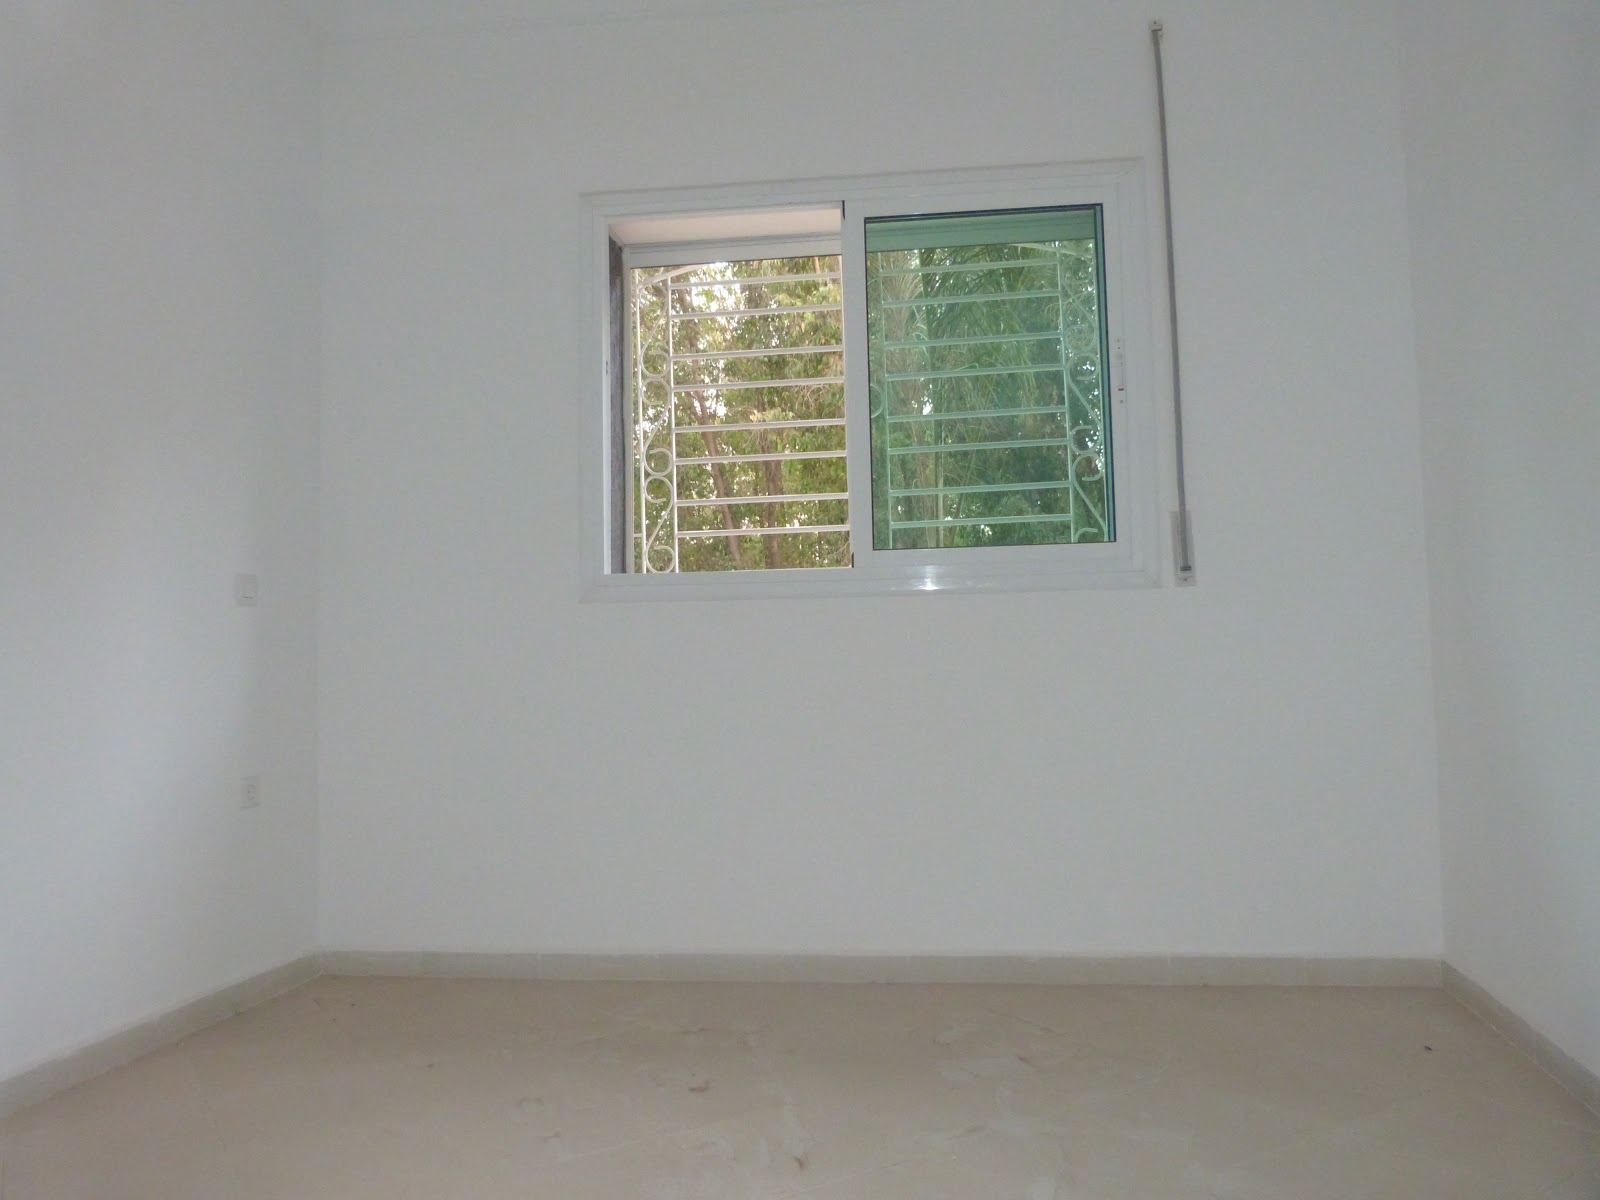 Carrelage Mural Salle De Bain Autocollant ~ agence immobili re appartements kenitra maghrib al arabi f1